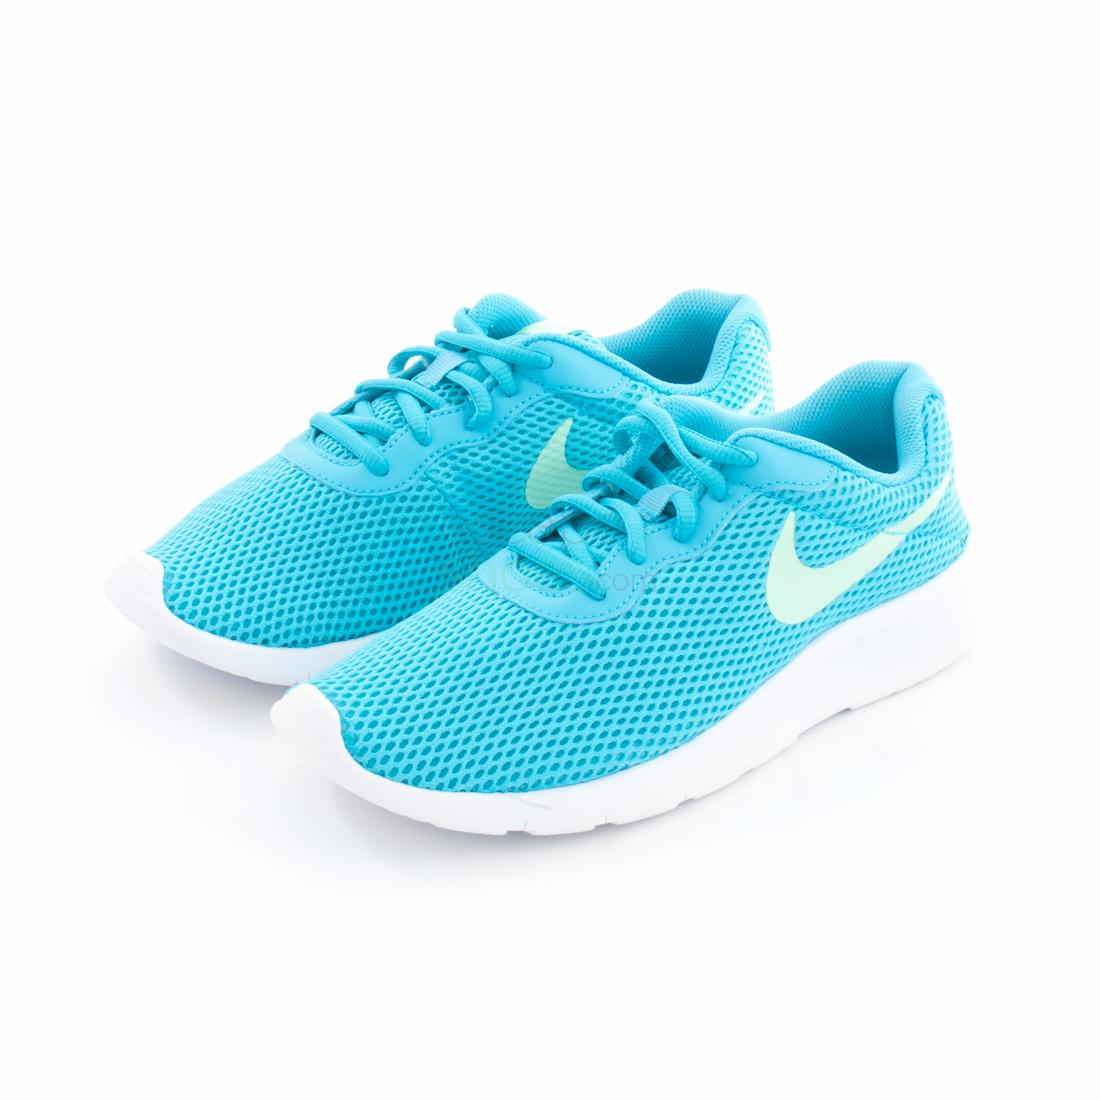 Mint Tanjun Tus Compra Aquí Zapatillas Blue Fresh Nike Chlorine 8p4Iq54